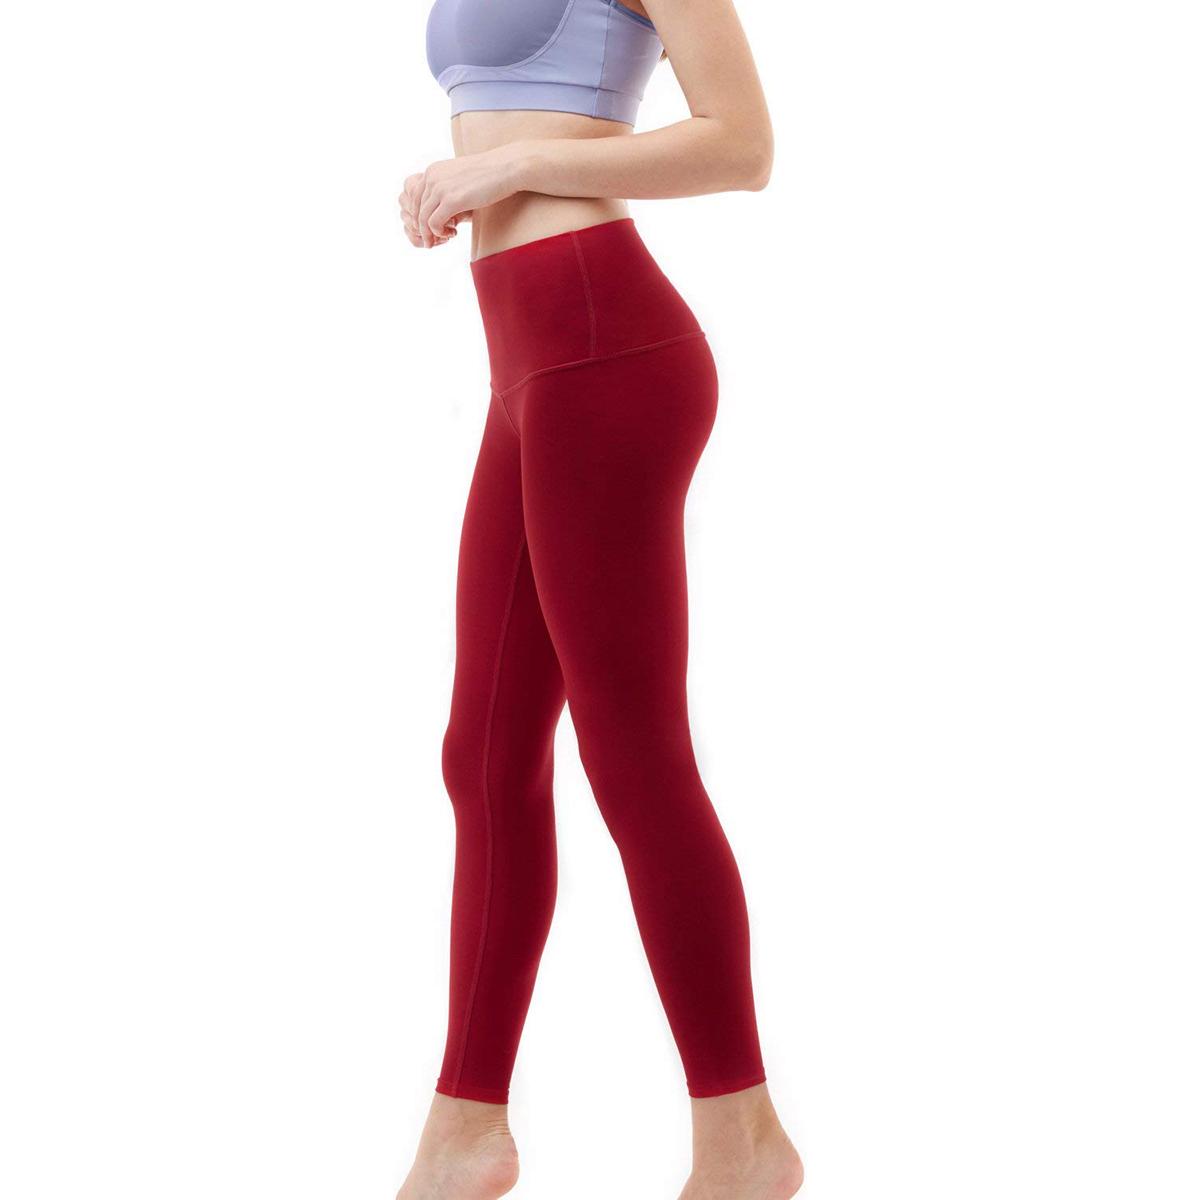 thumbnail 28 - TSLA Tesla FYP52 Women's High-Waisted Ultra-Stretch Tummy Control Yoga Pants